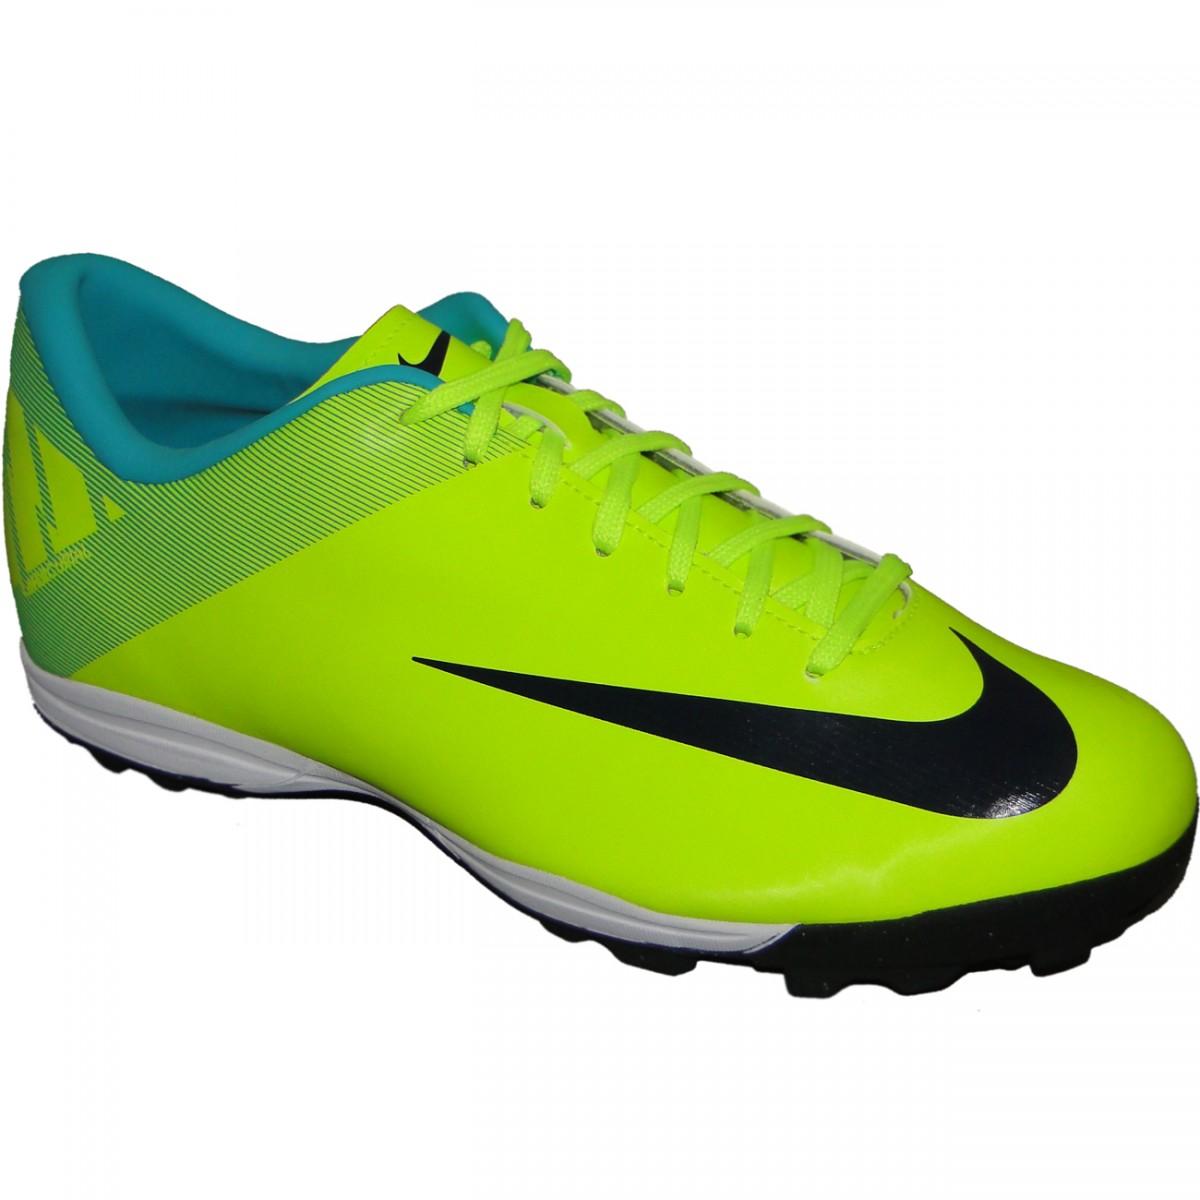 1c108a65dcd0e Chuteira Society Nike Mercurial Victory Ii 1620 - VERDE/LIMÃO ...